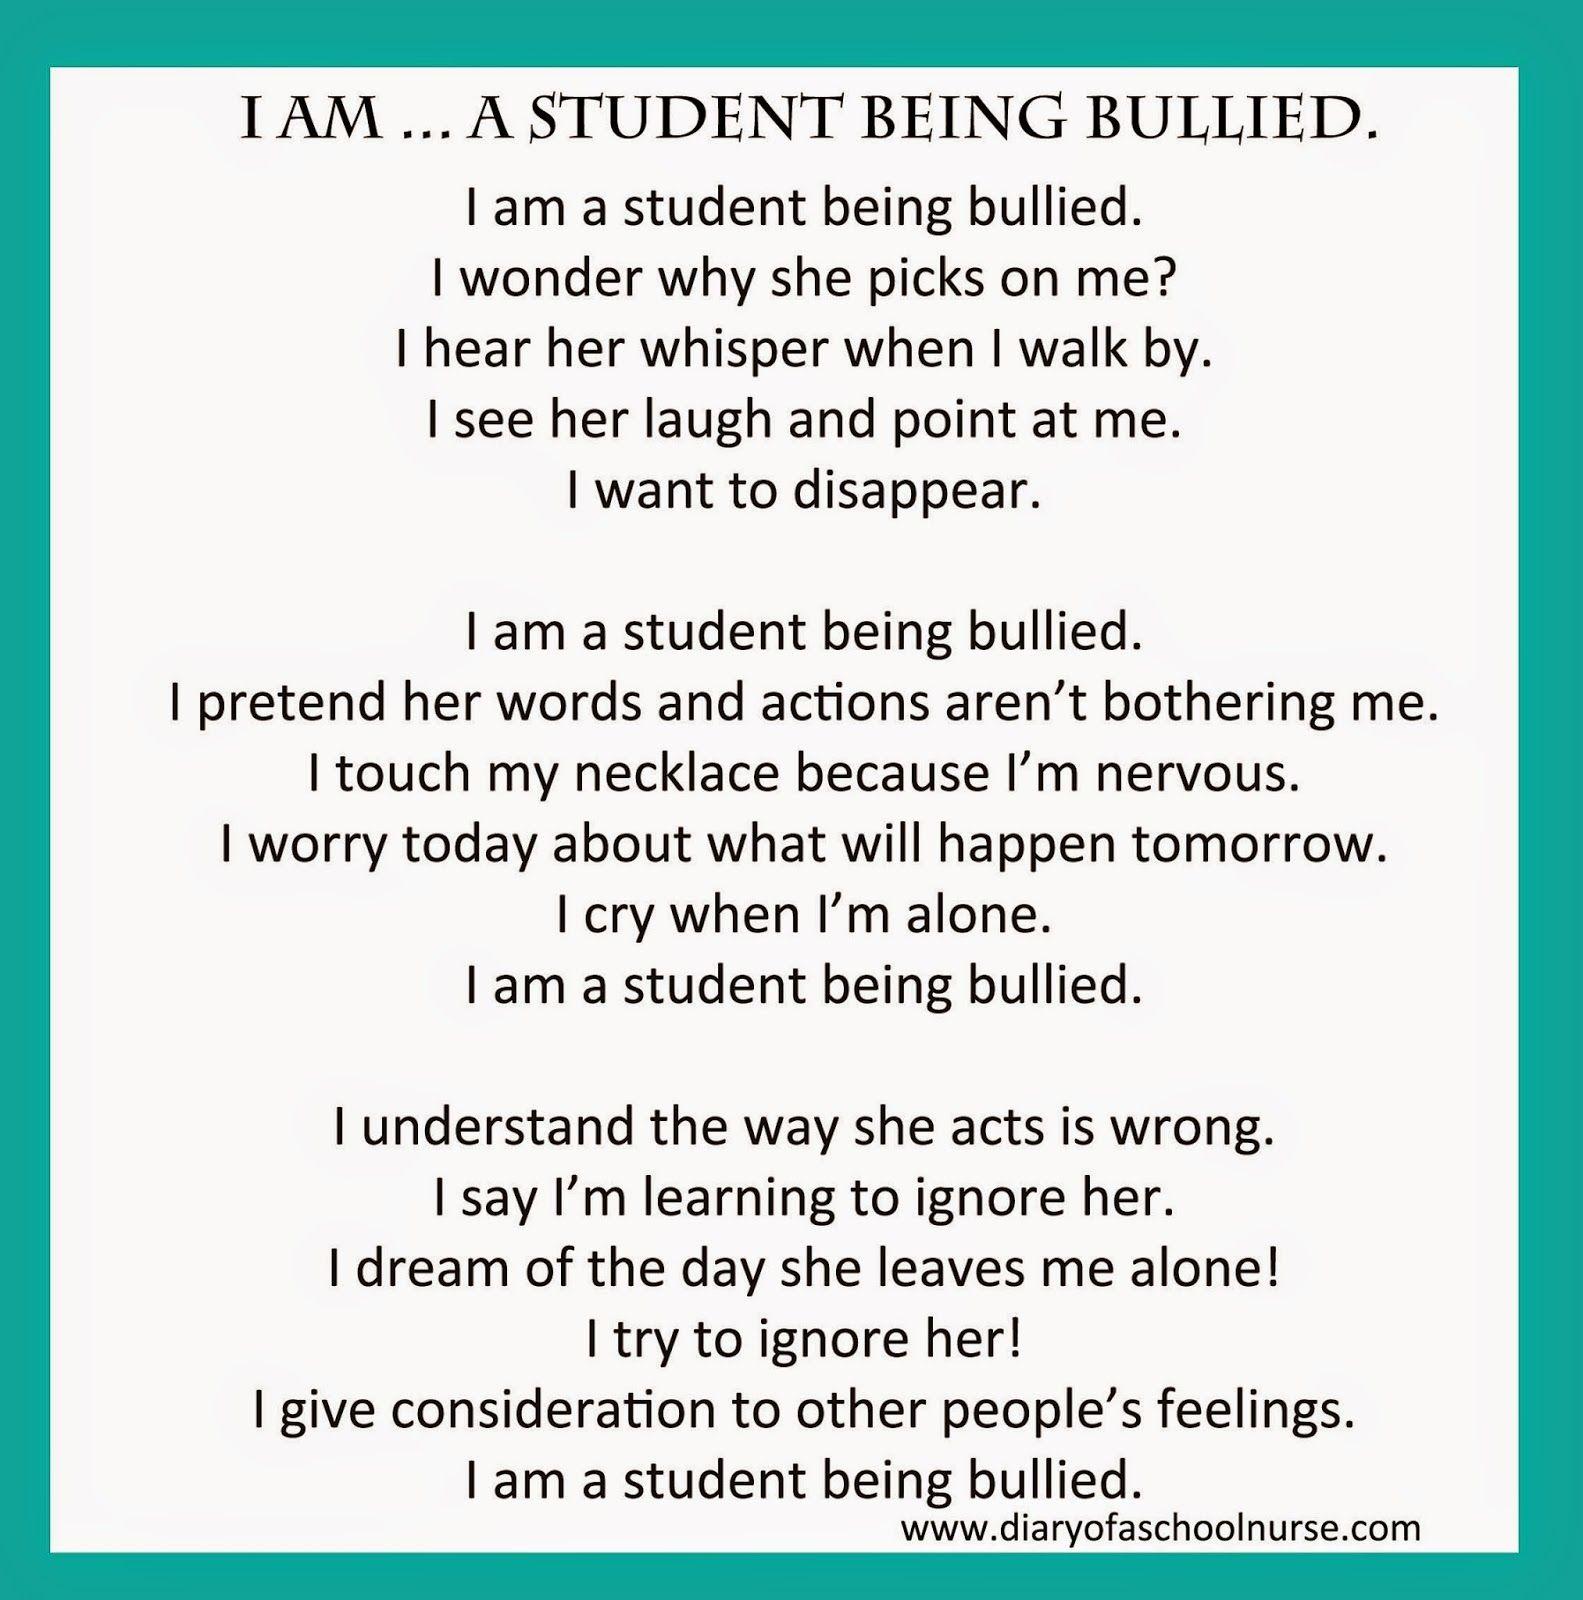 Diary Of A School Nurse Bullying